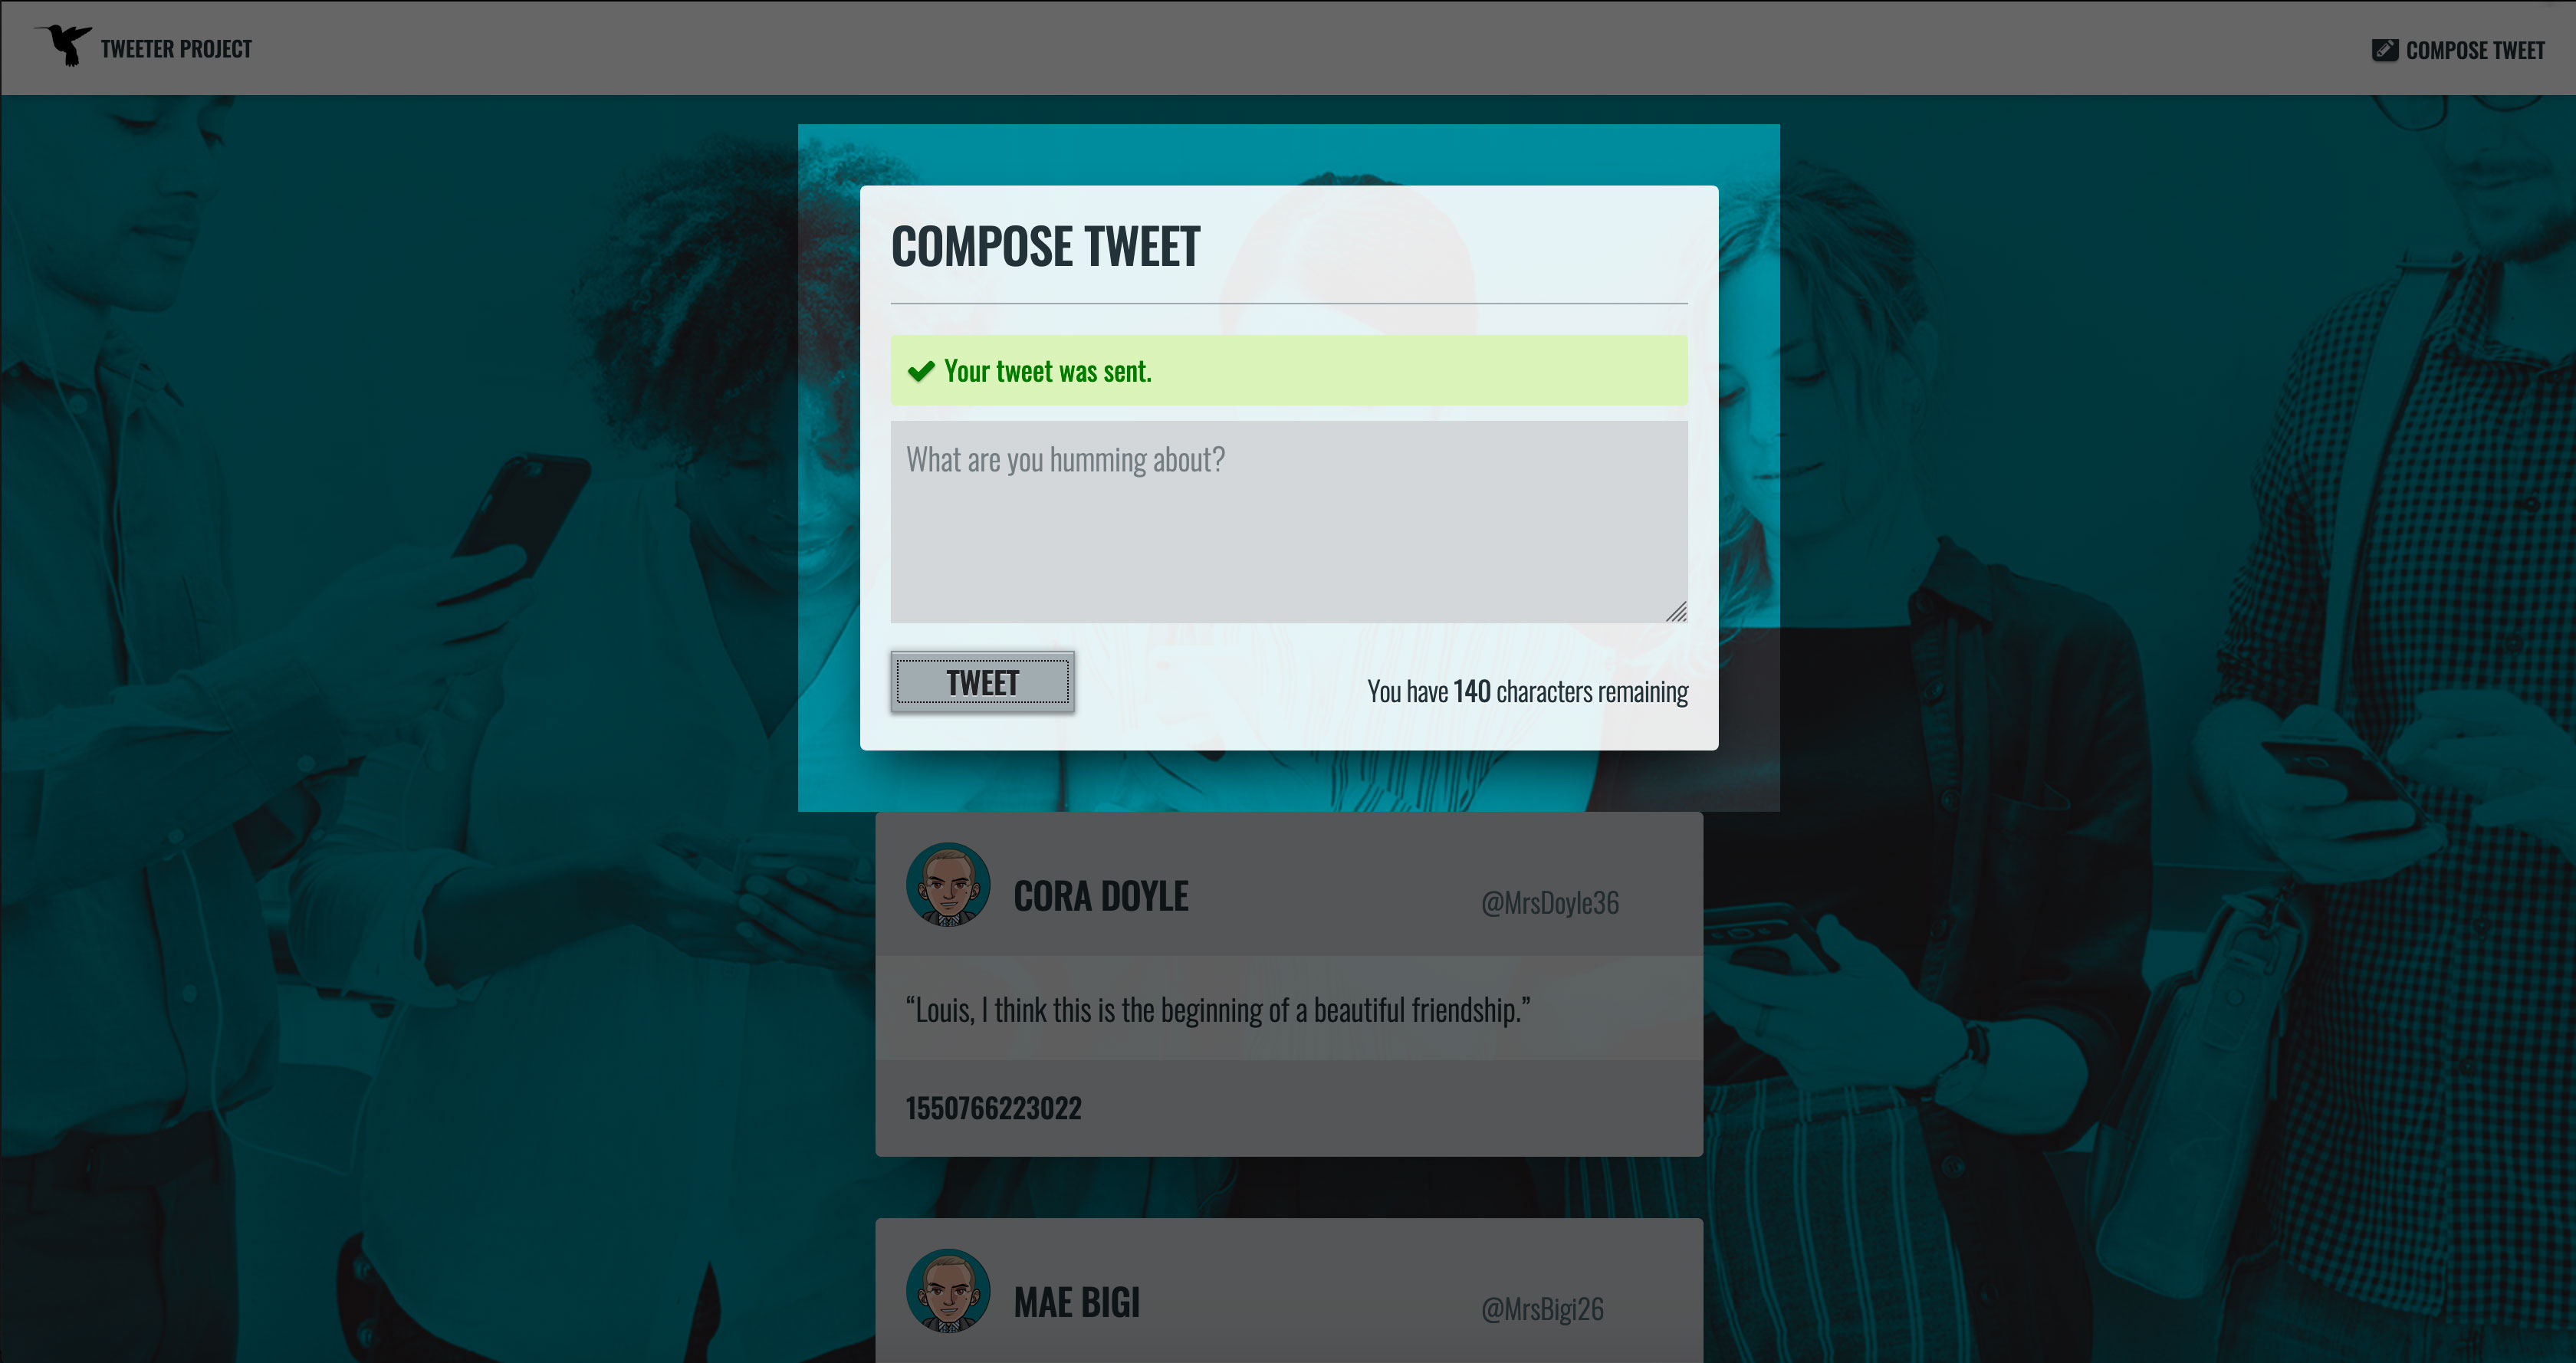 New Tweet, Web Form: Success Message